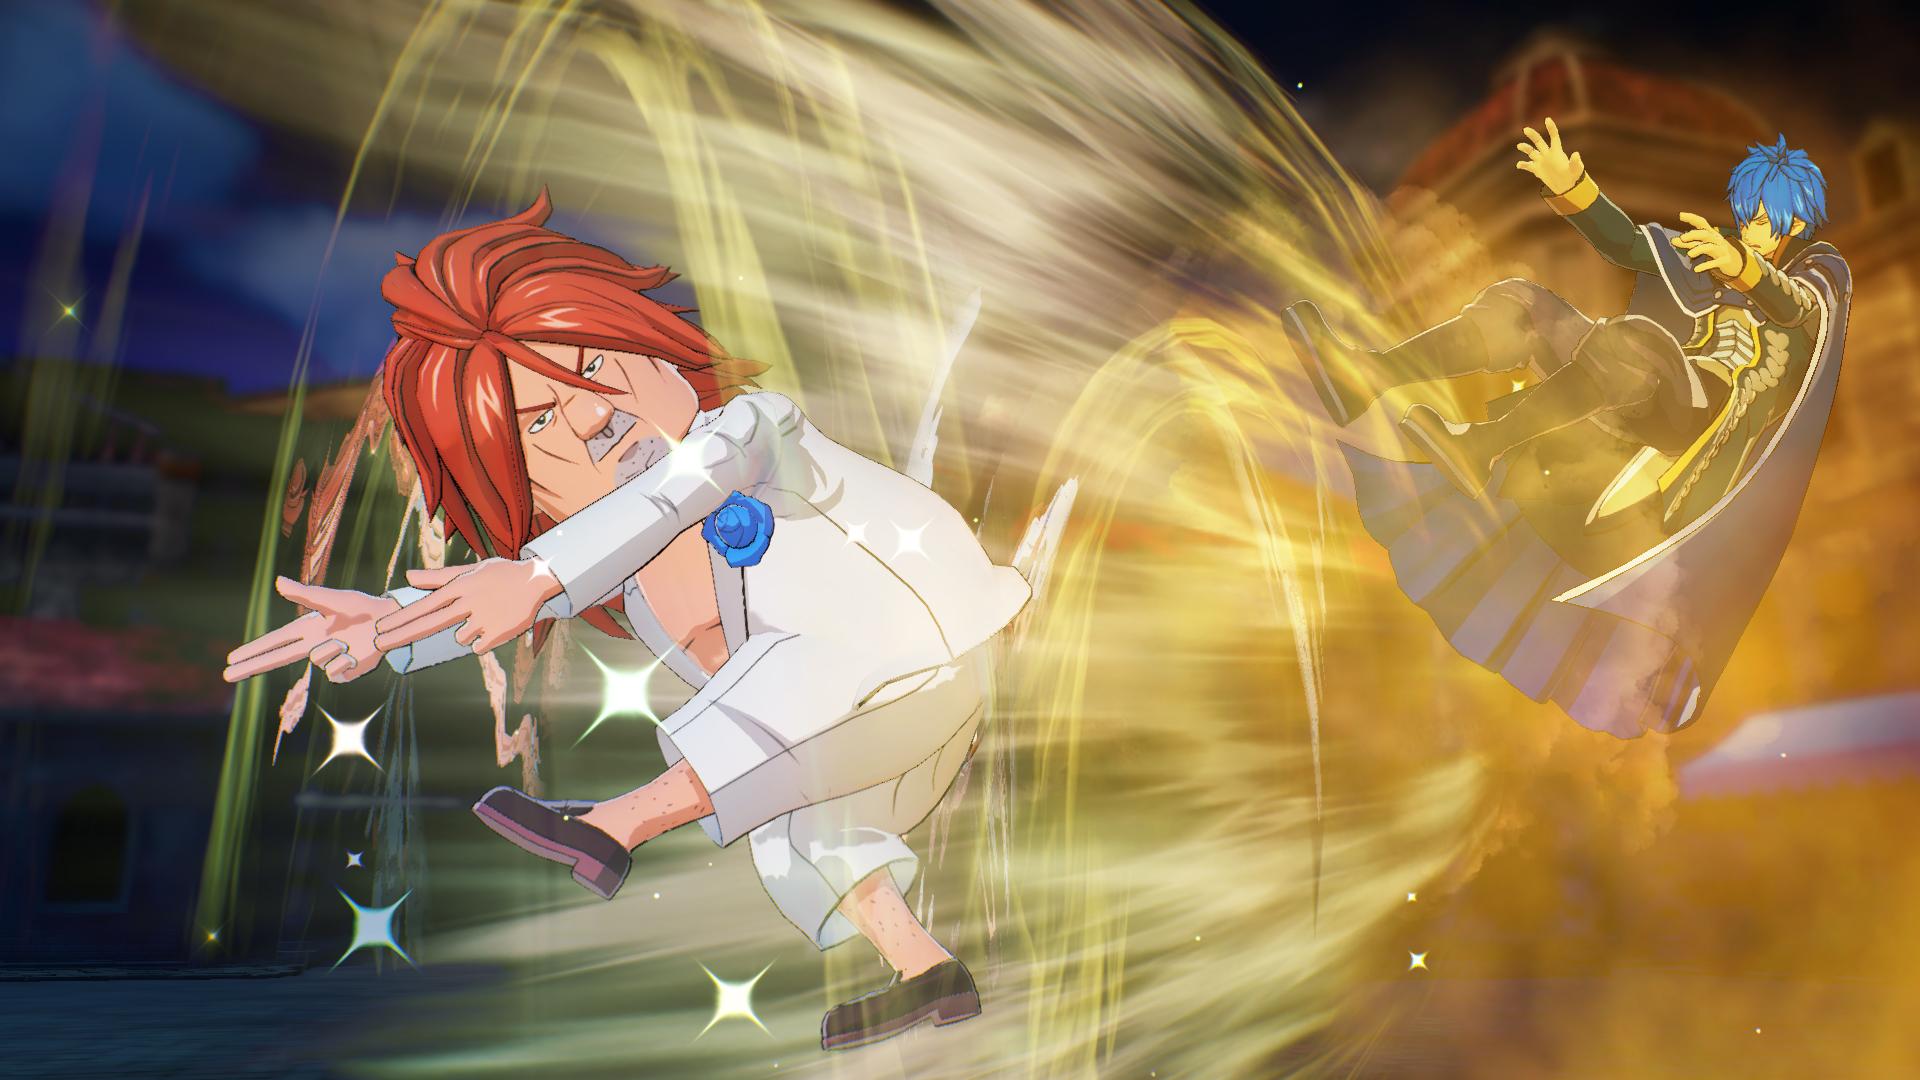 Fairy Tail Screen 4